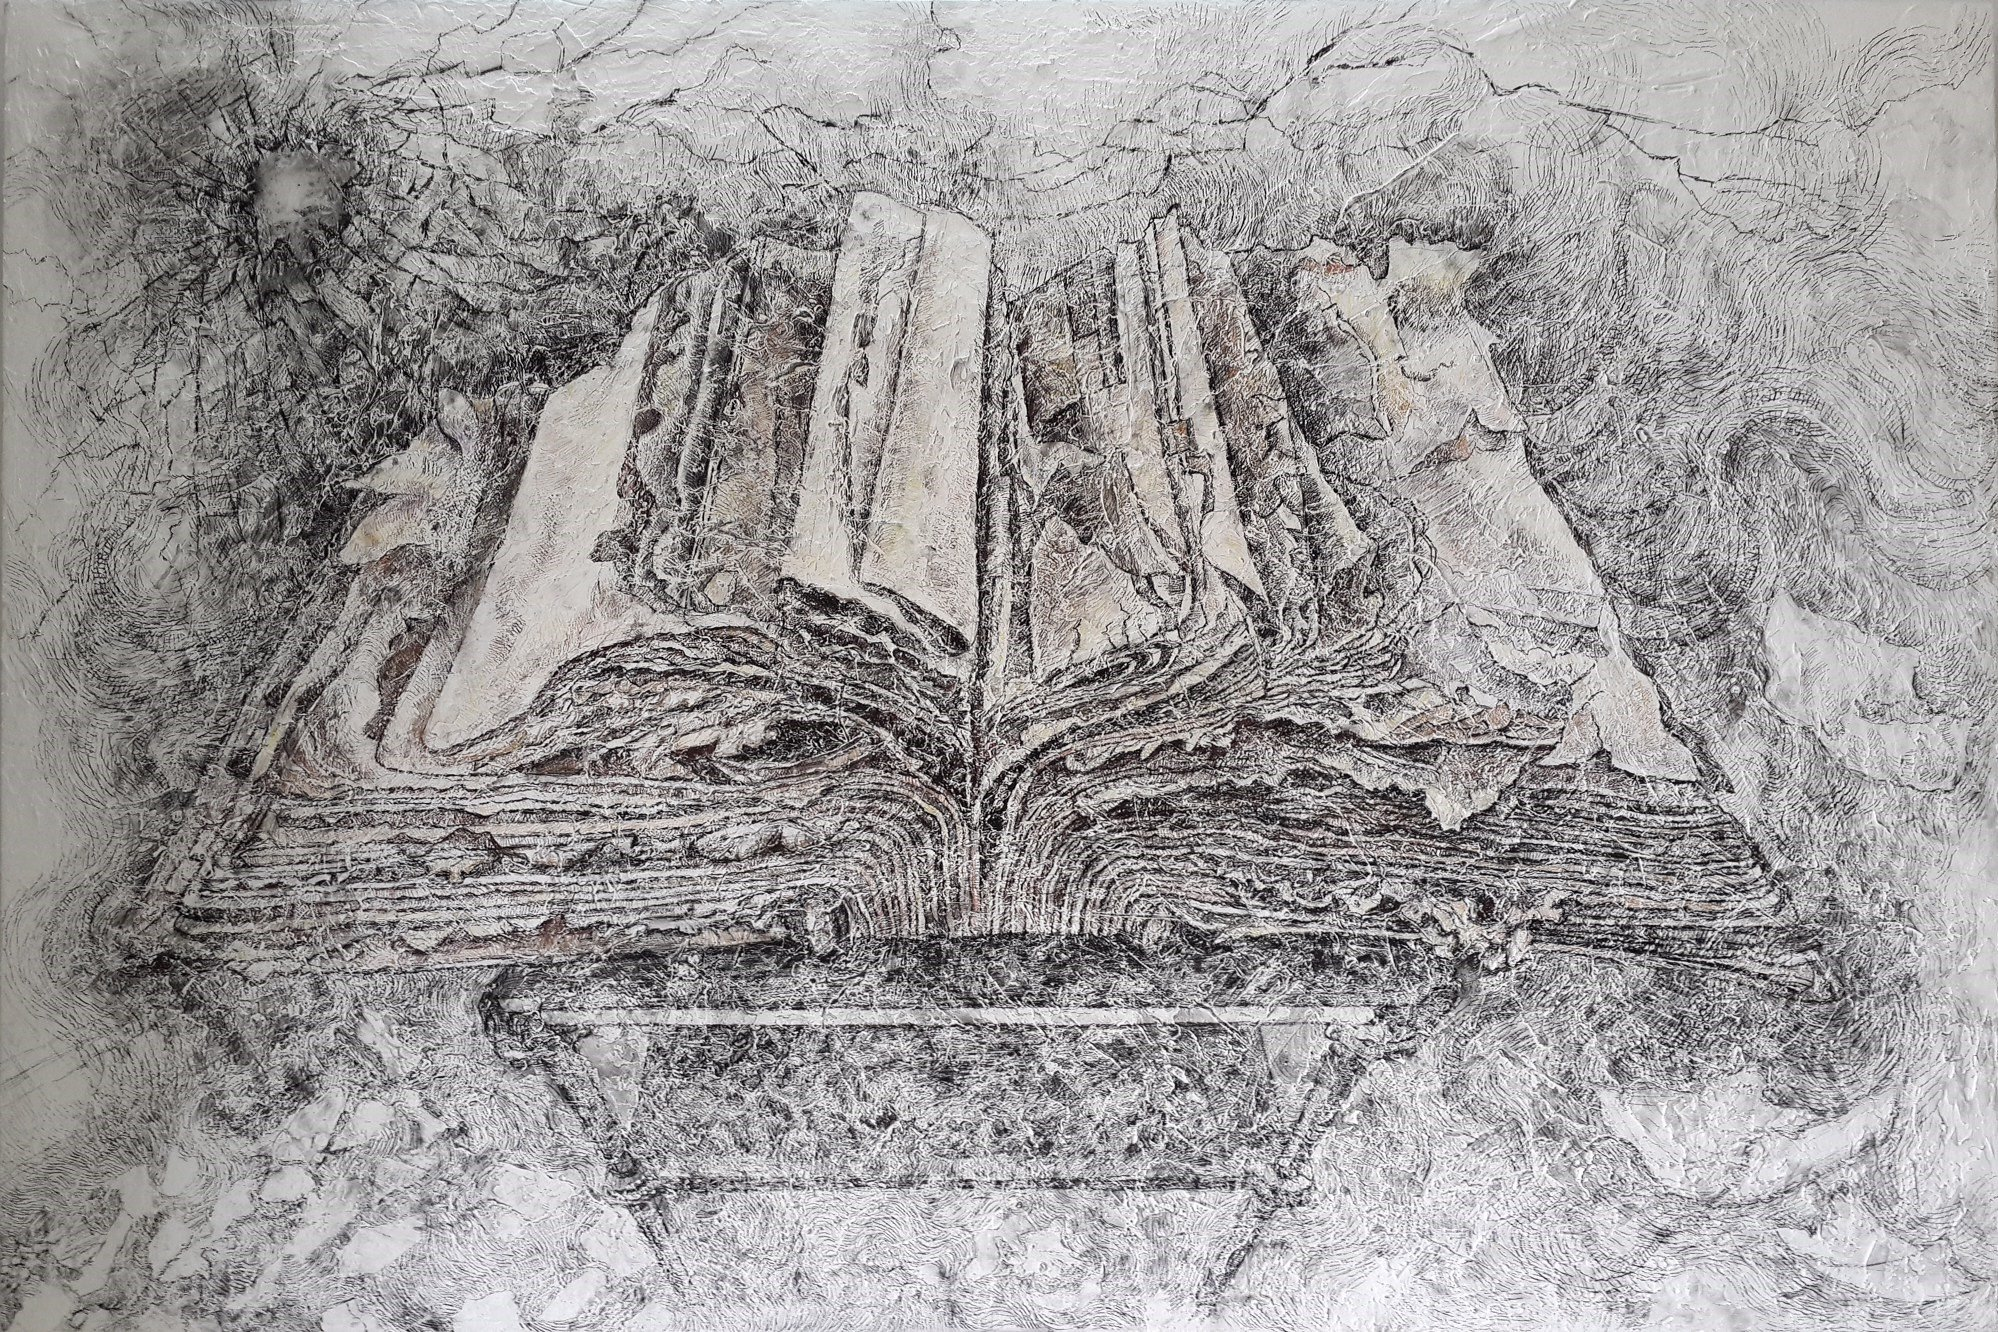 sketch of a book